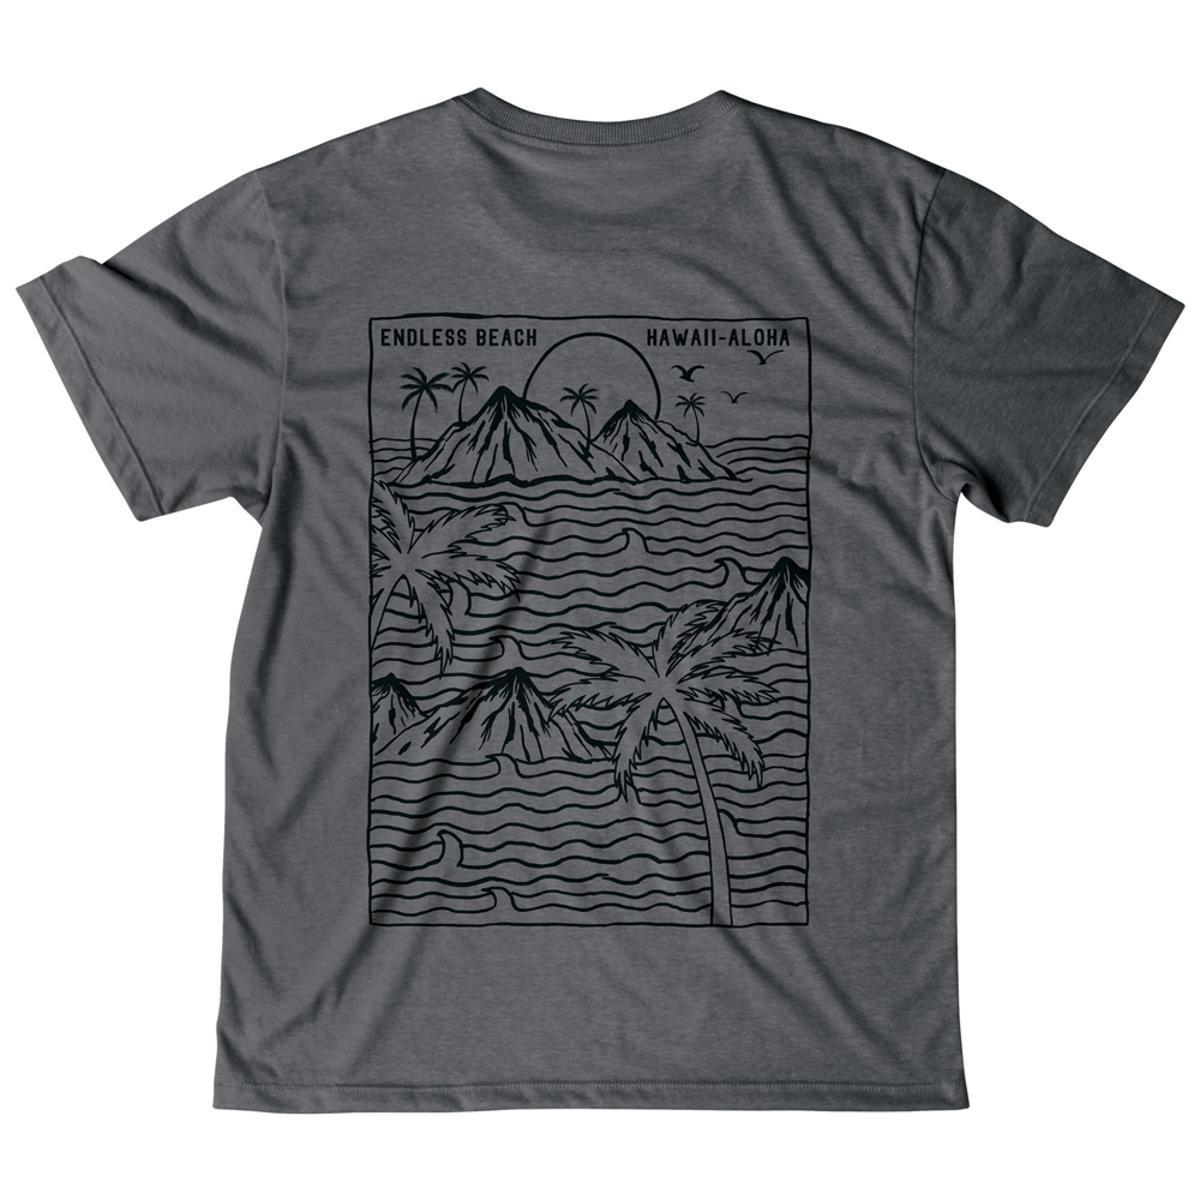 Camiseta Mash Malha Ecológica Masculina - Preto